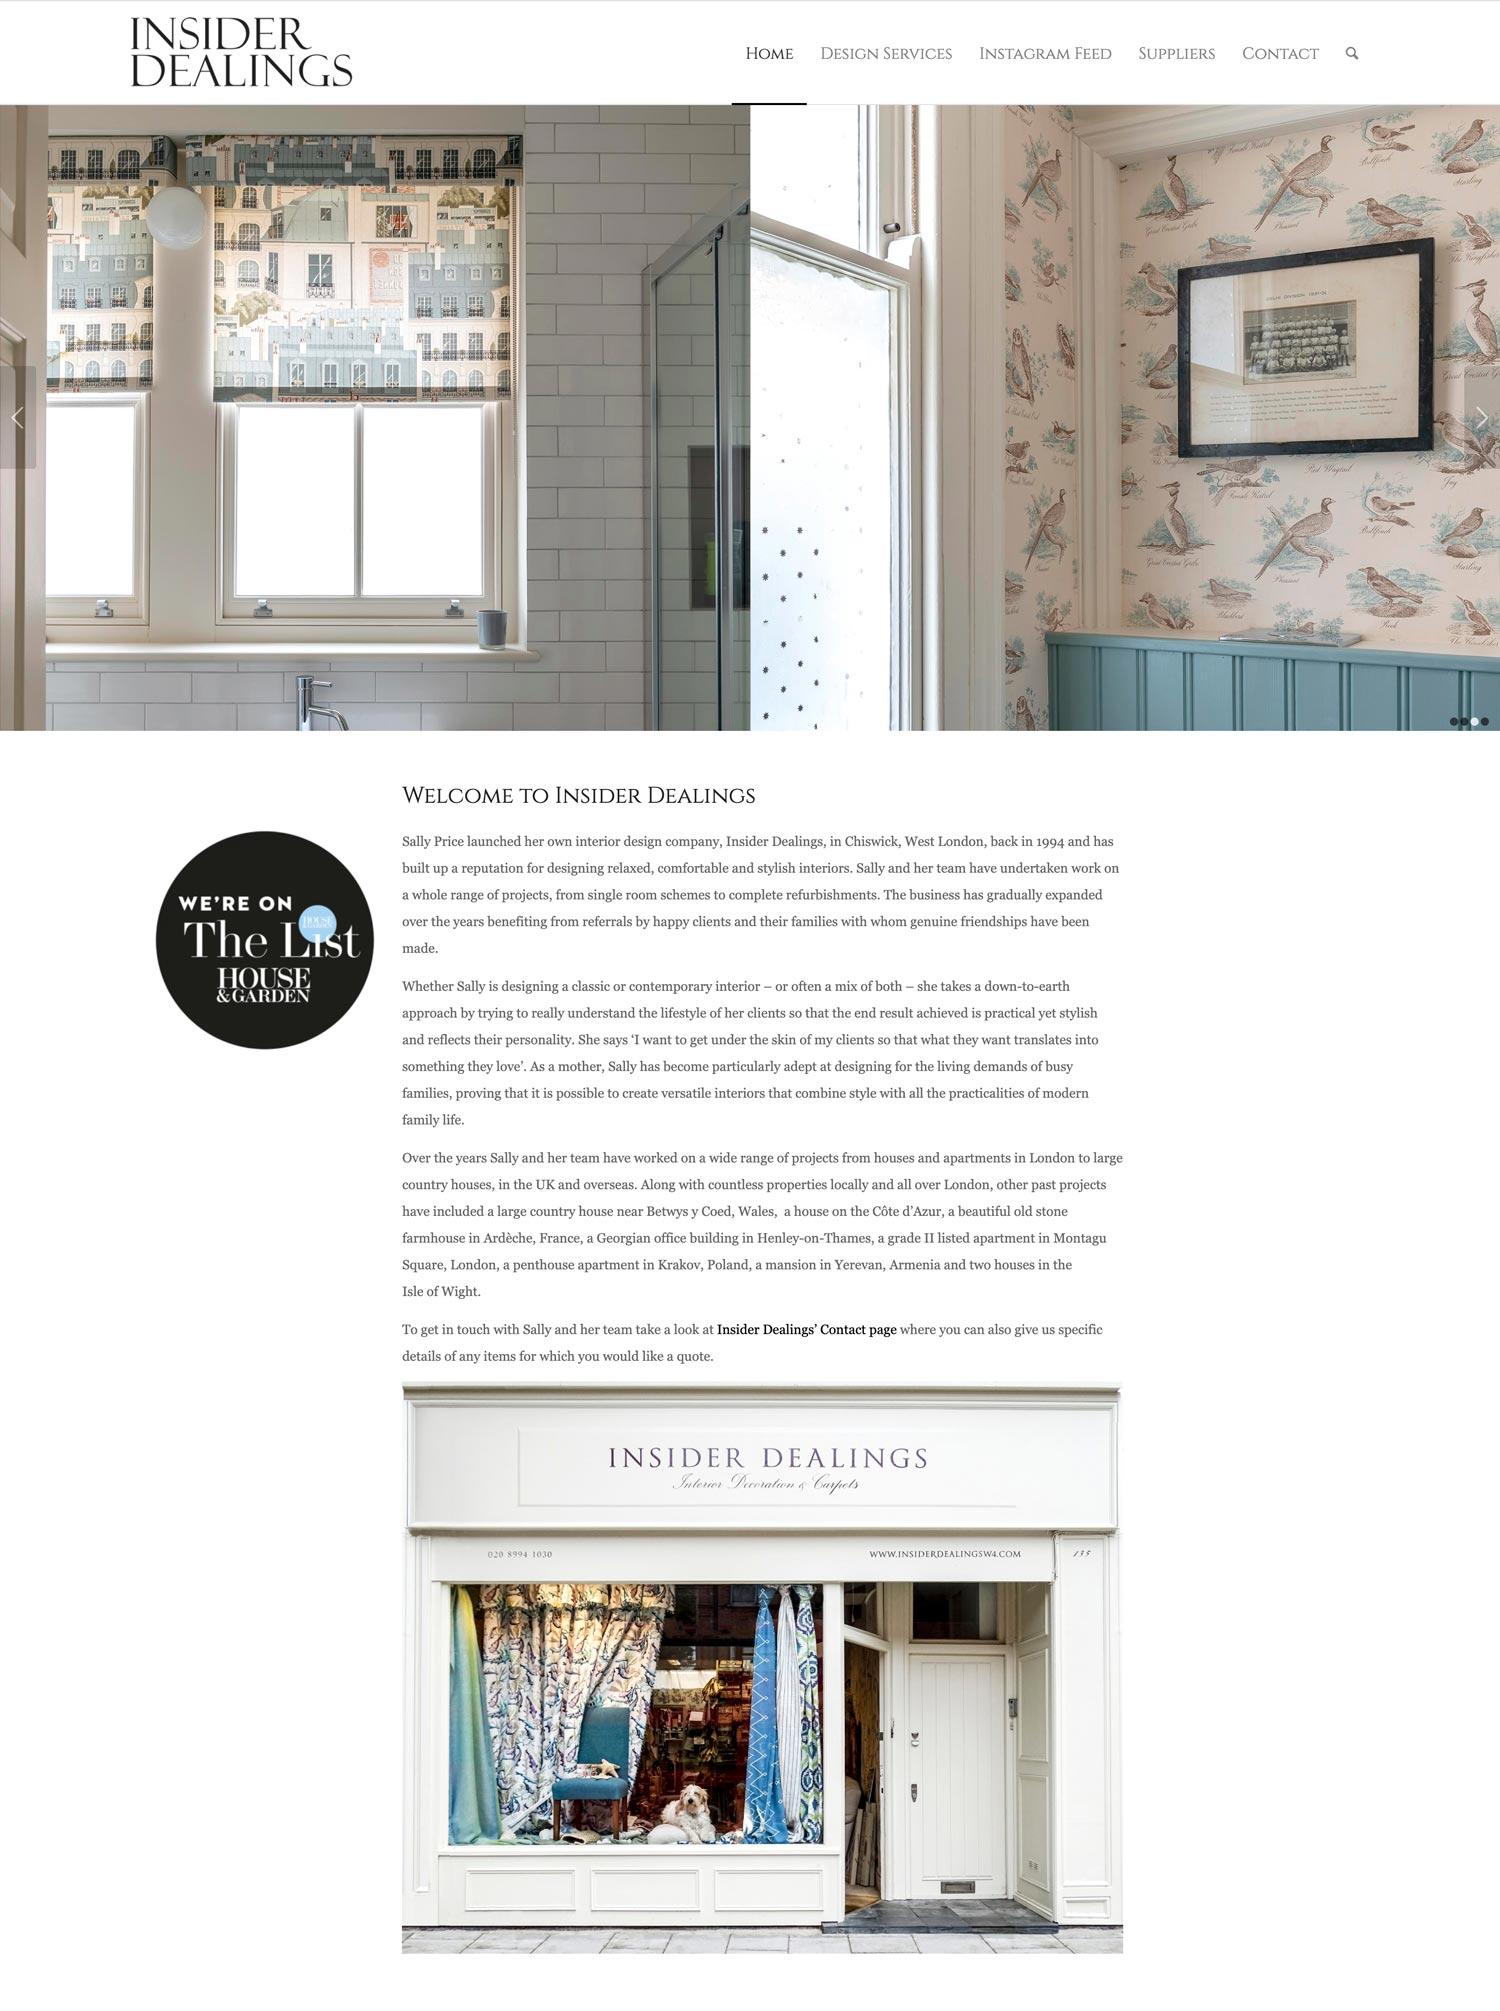 Insider Dealings Website Home 4